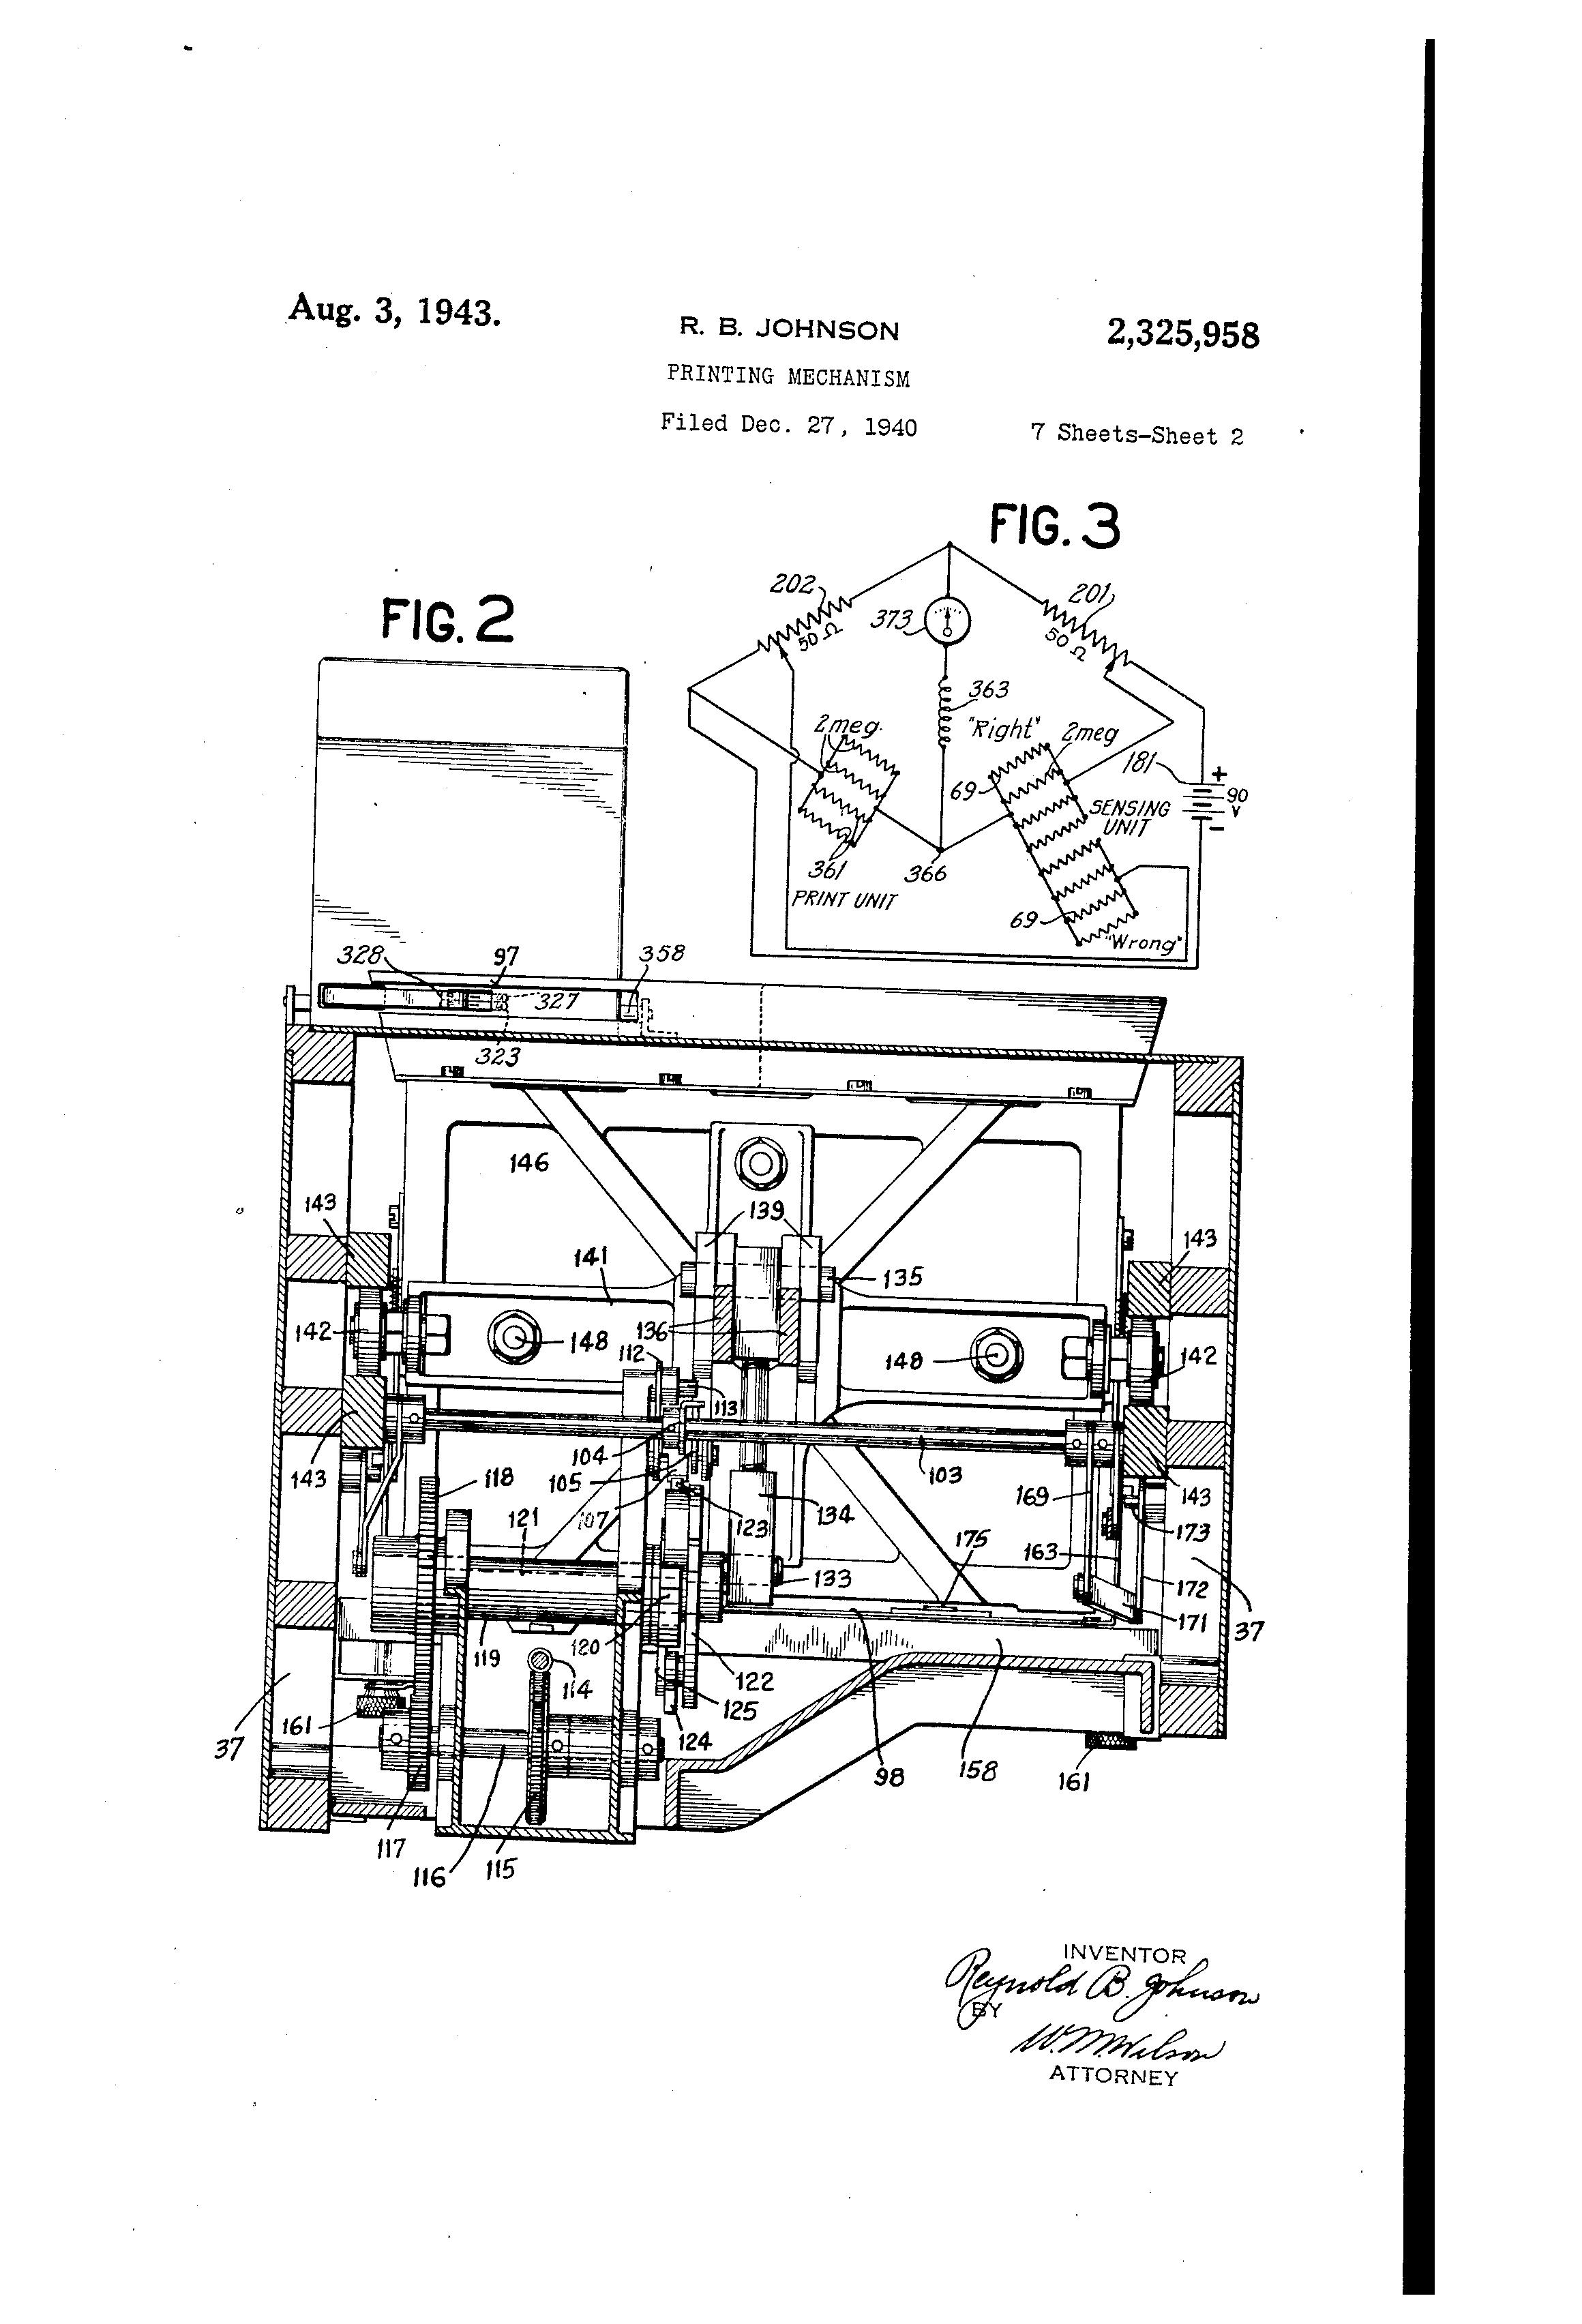 pressure transducer wiring diagram images wiring diagram wiring diagrams pictures wiring